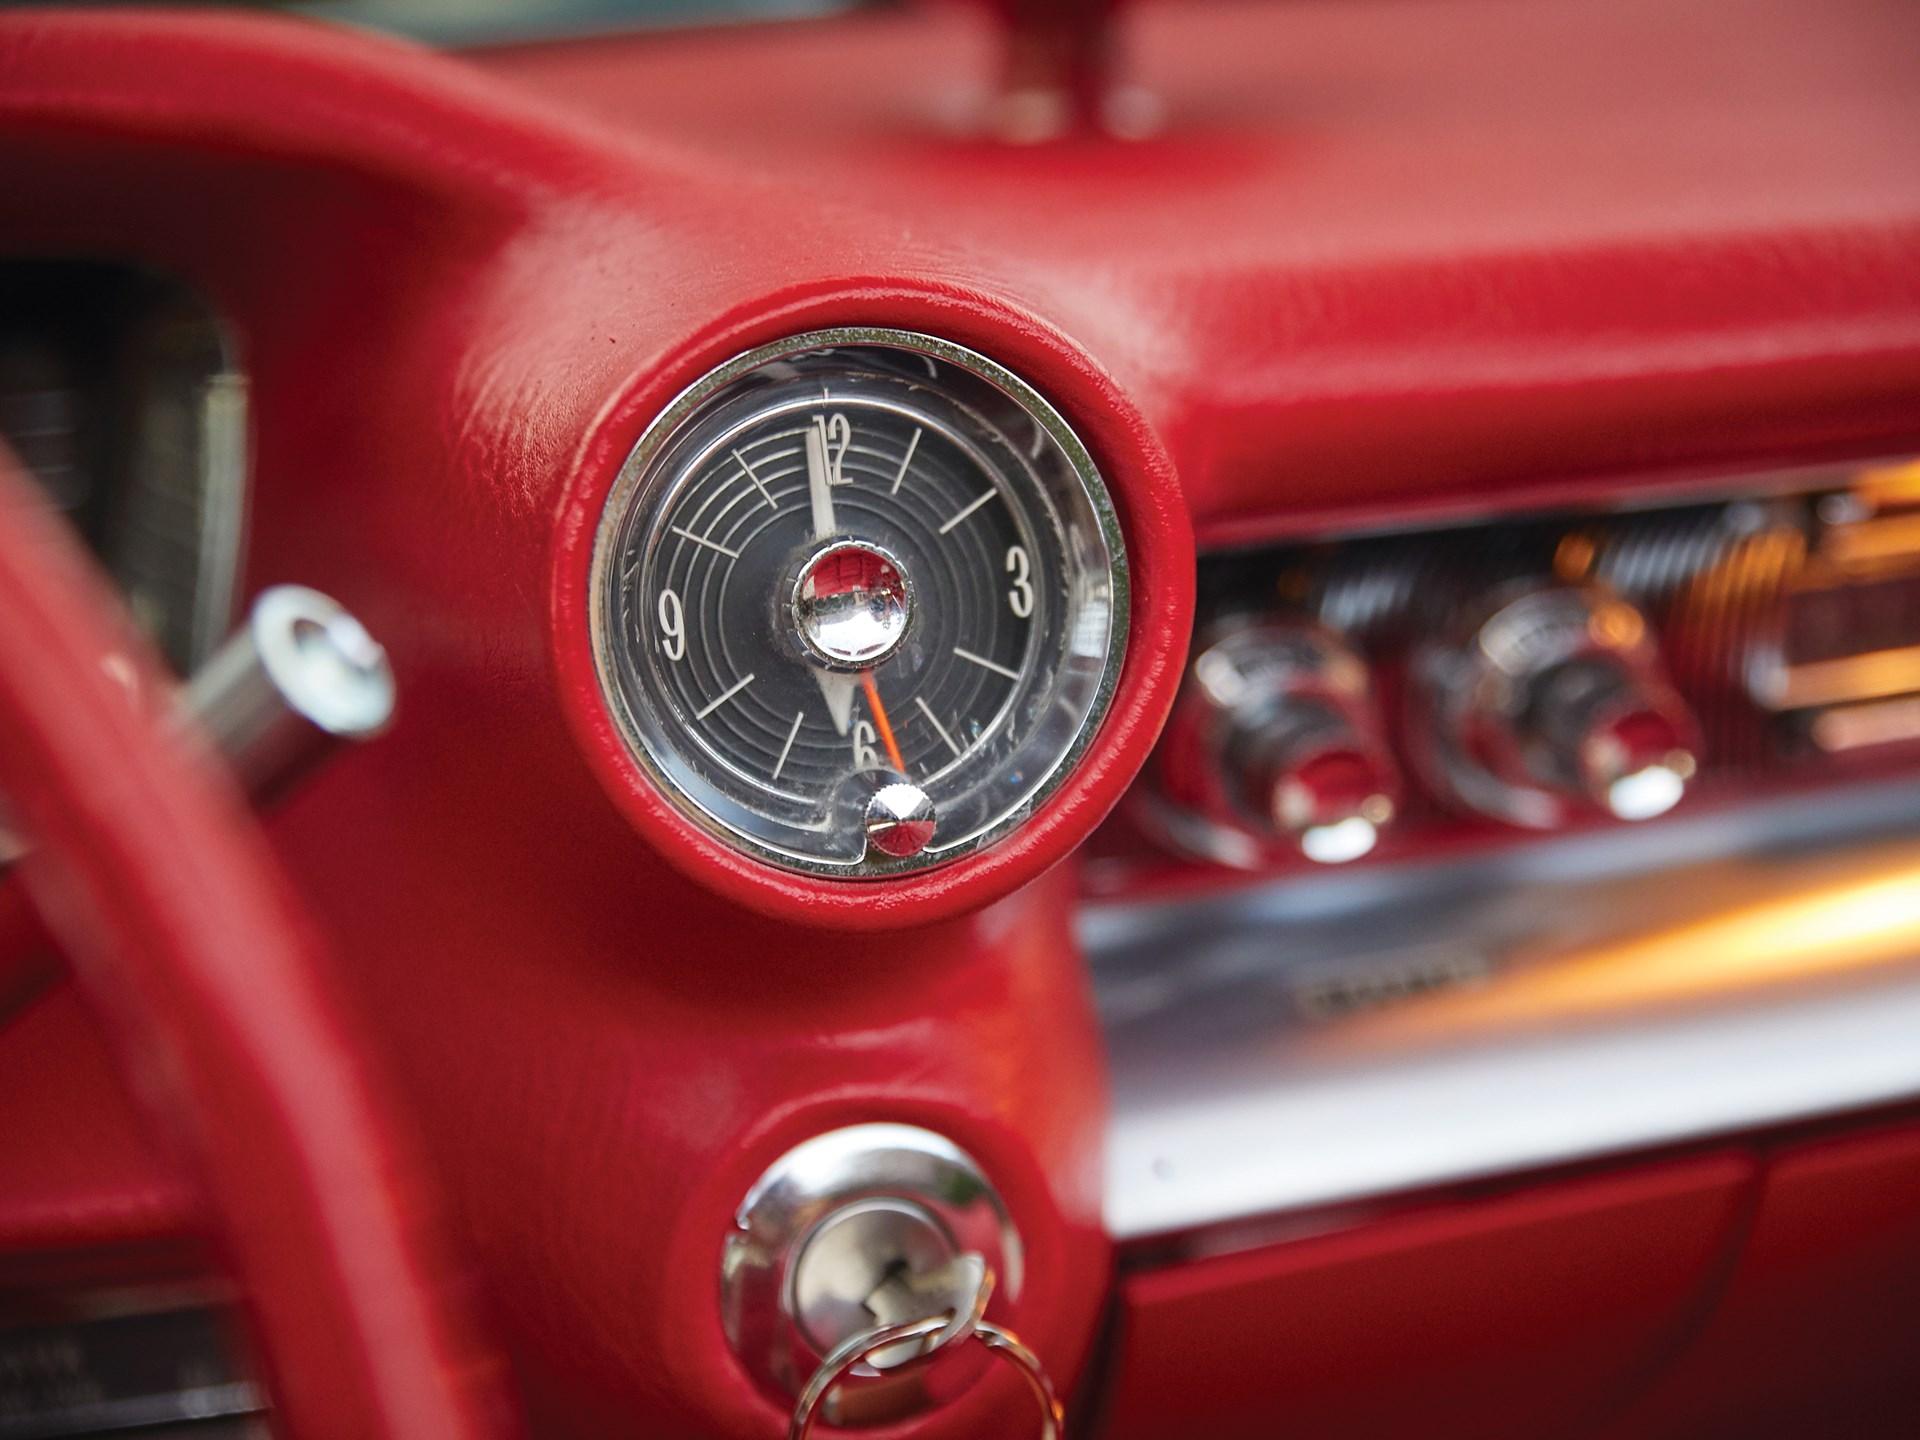 1959 Cadillac Eldorado Biarritz